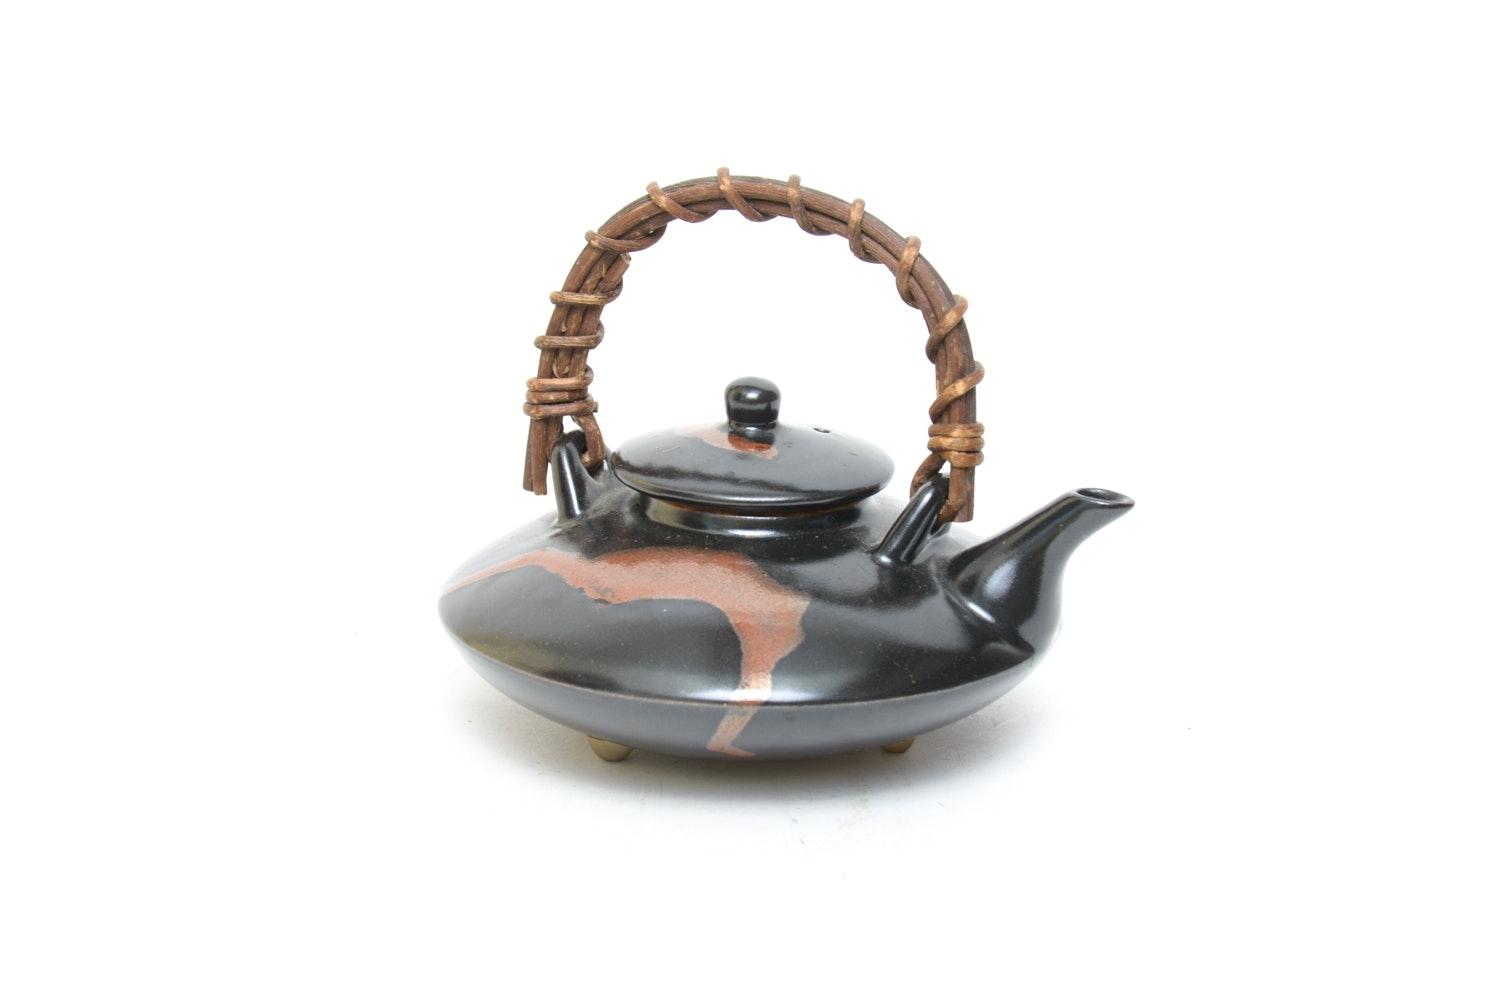 Japanese Ceramic Teapot with Vine Handle